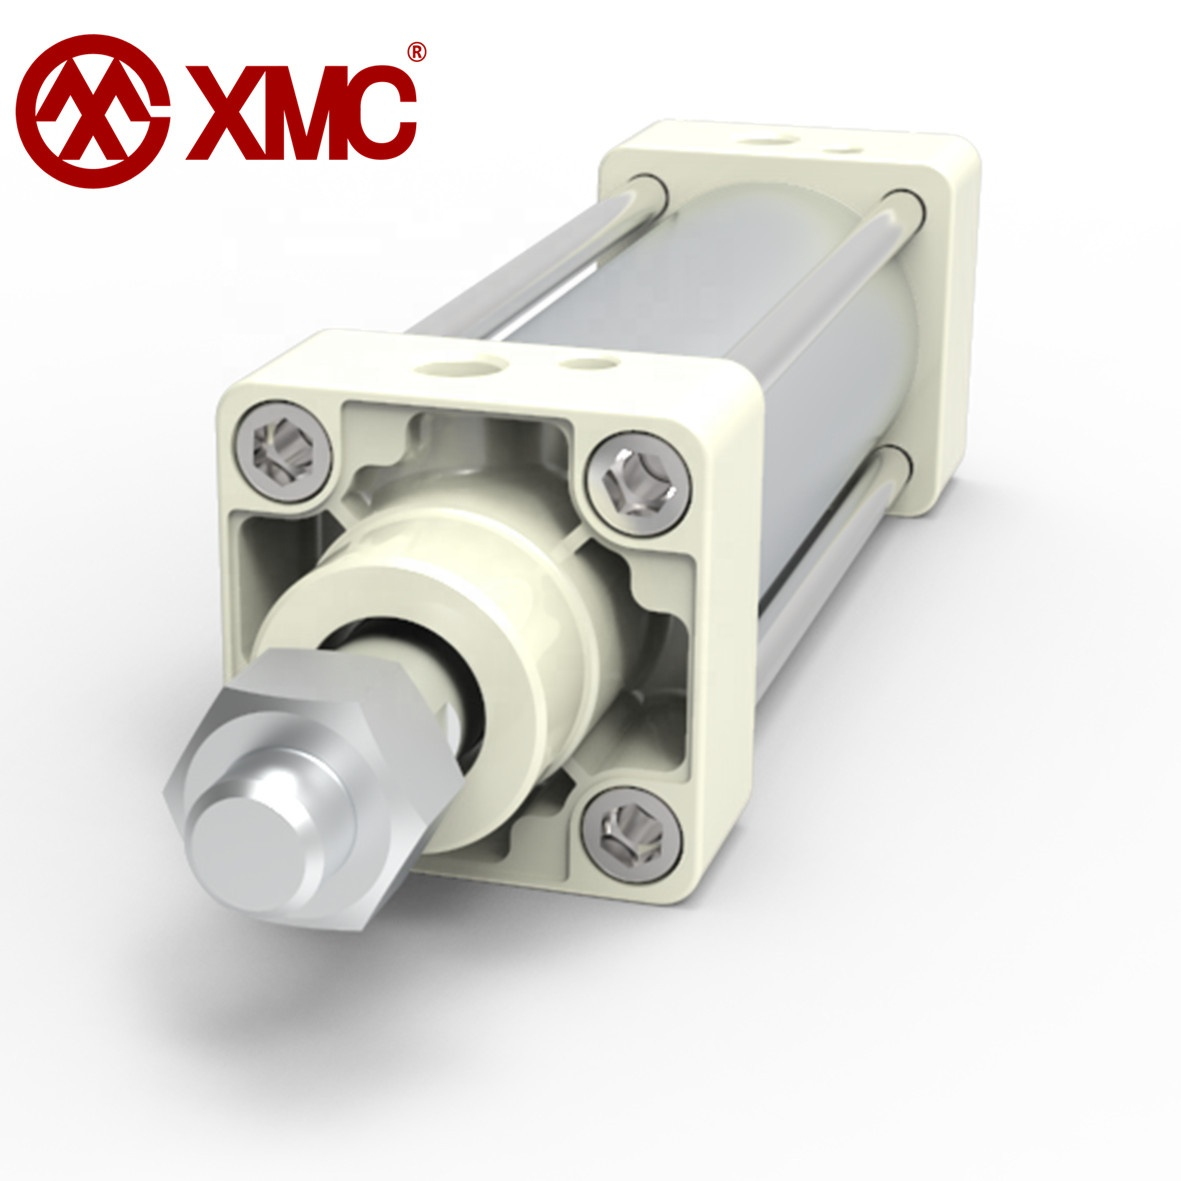 XMC Air Cylinder 10/16mm Bore 25~500mm Stroke Telescopic Screwed Piston Rod for Pnrumatic Hydraulic High Pressure Cylinder